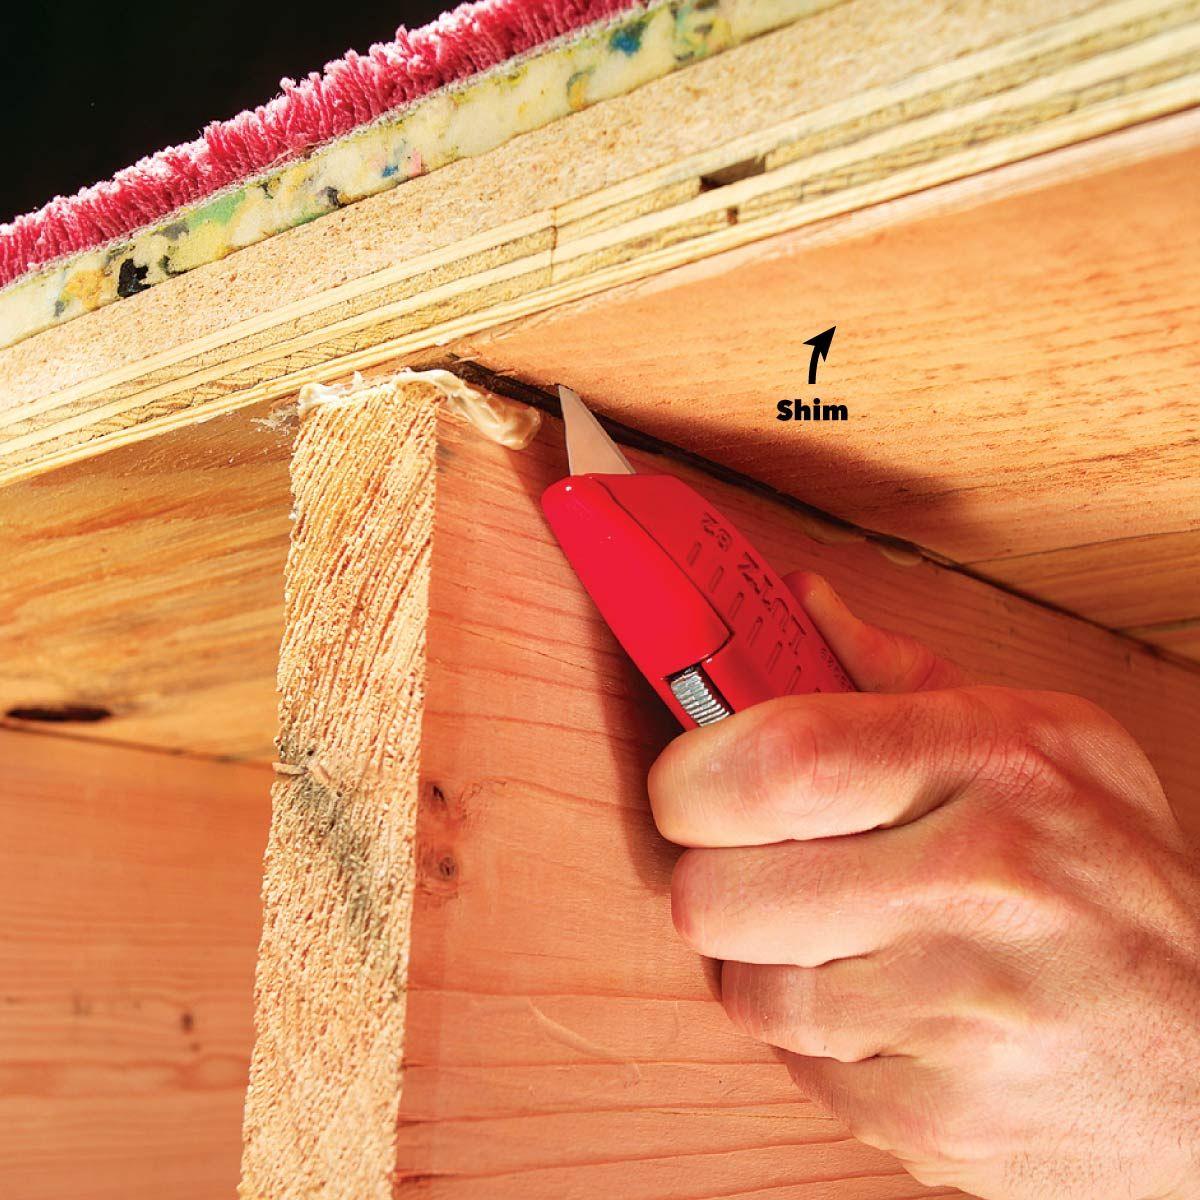 How To Fix Squeaky Floors Squeaky Floors Fix Squeaky Floors Flooring